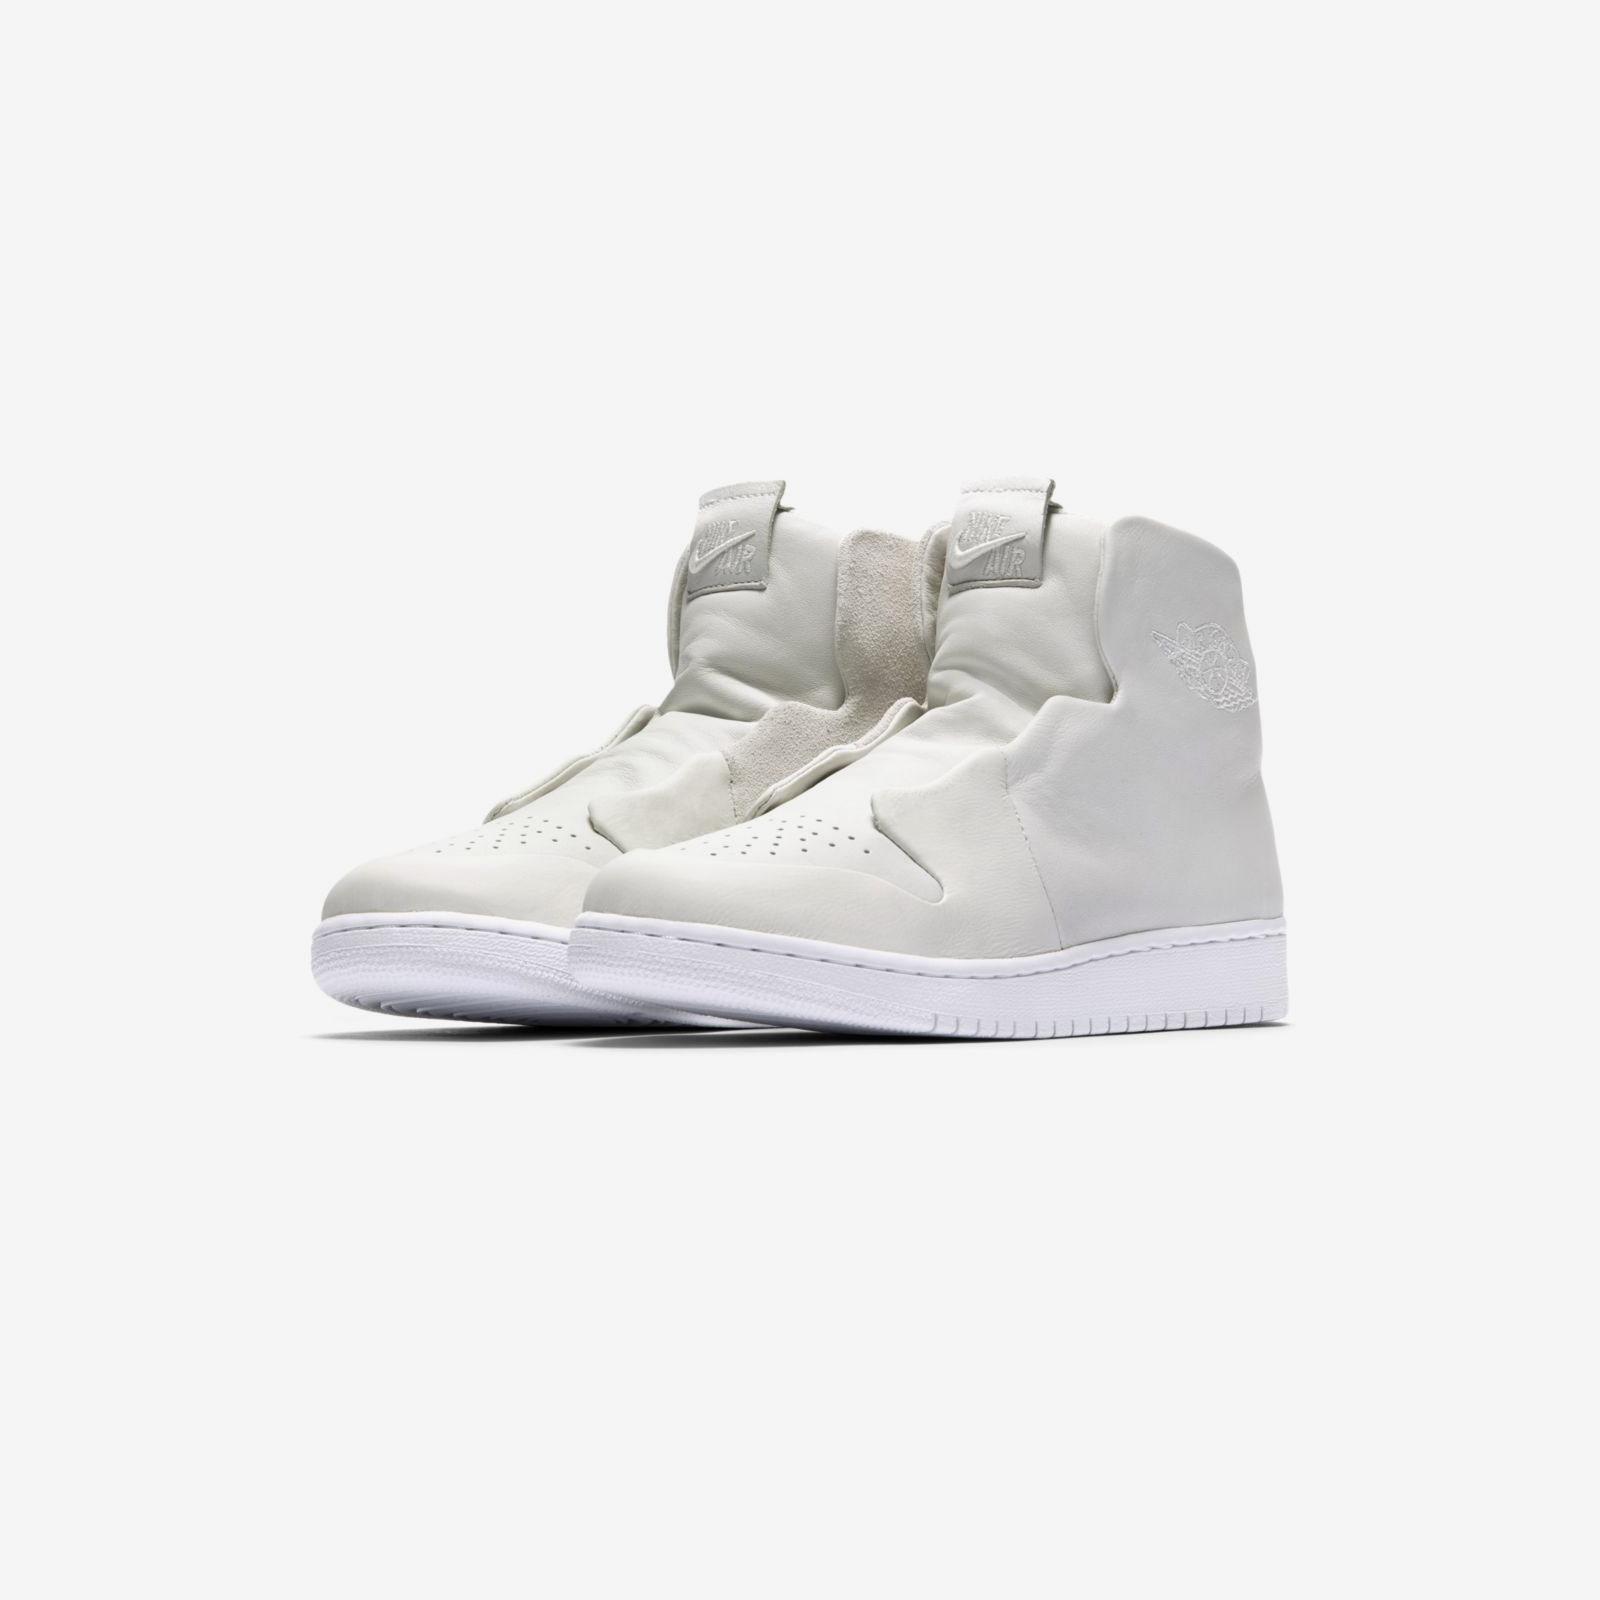 buy popular de27c 7e668 Jordan Brand Air Jordan 1 Sage XX THE 1, REIMAGINED